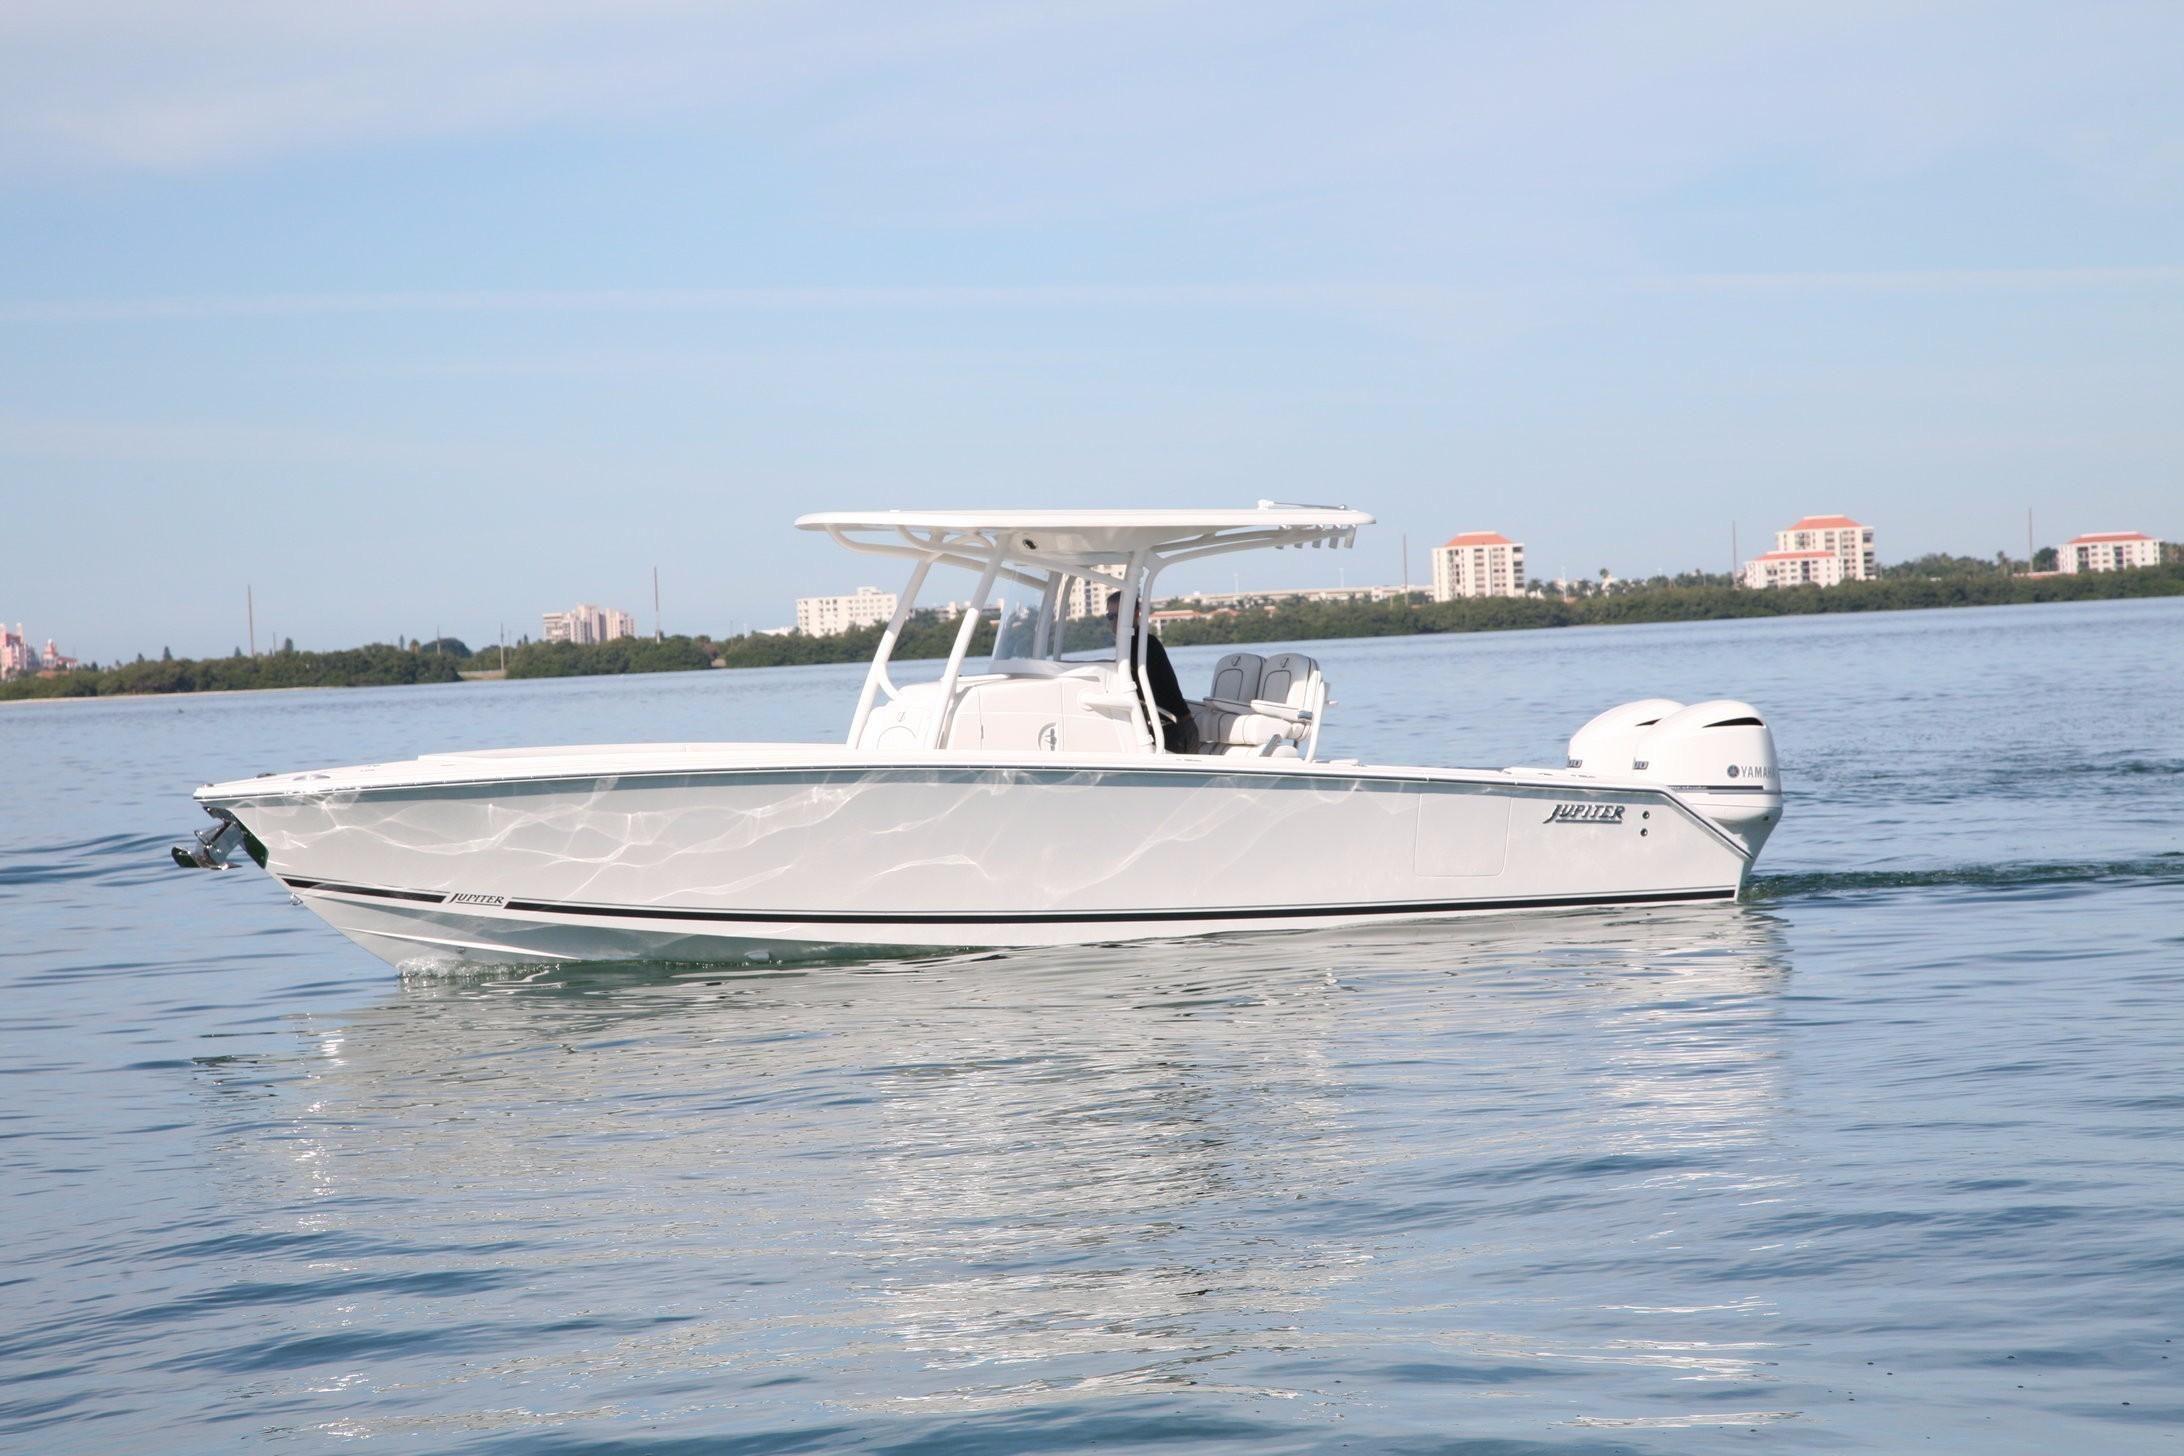 2017 Jupiter 30 HFS Power Boat For Sale - www yachtworld com